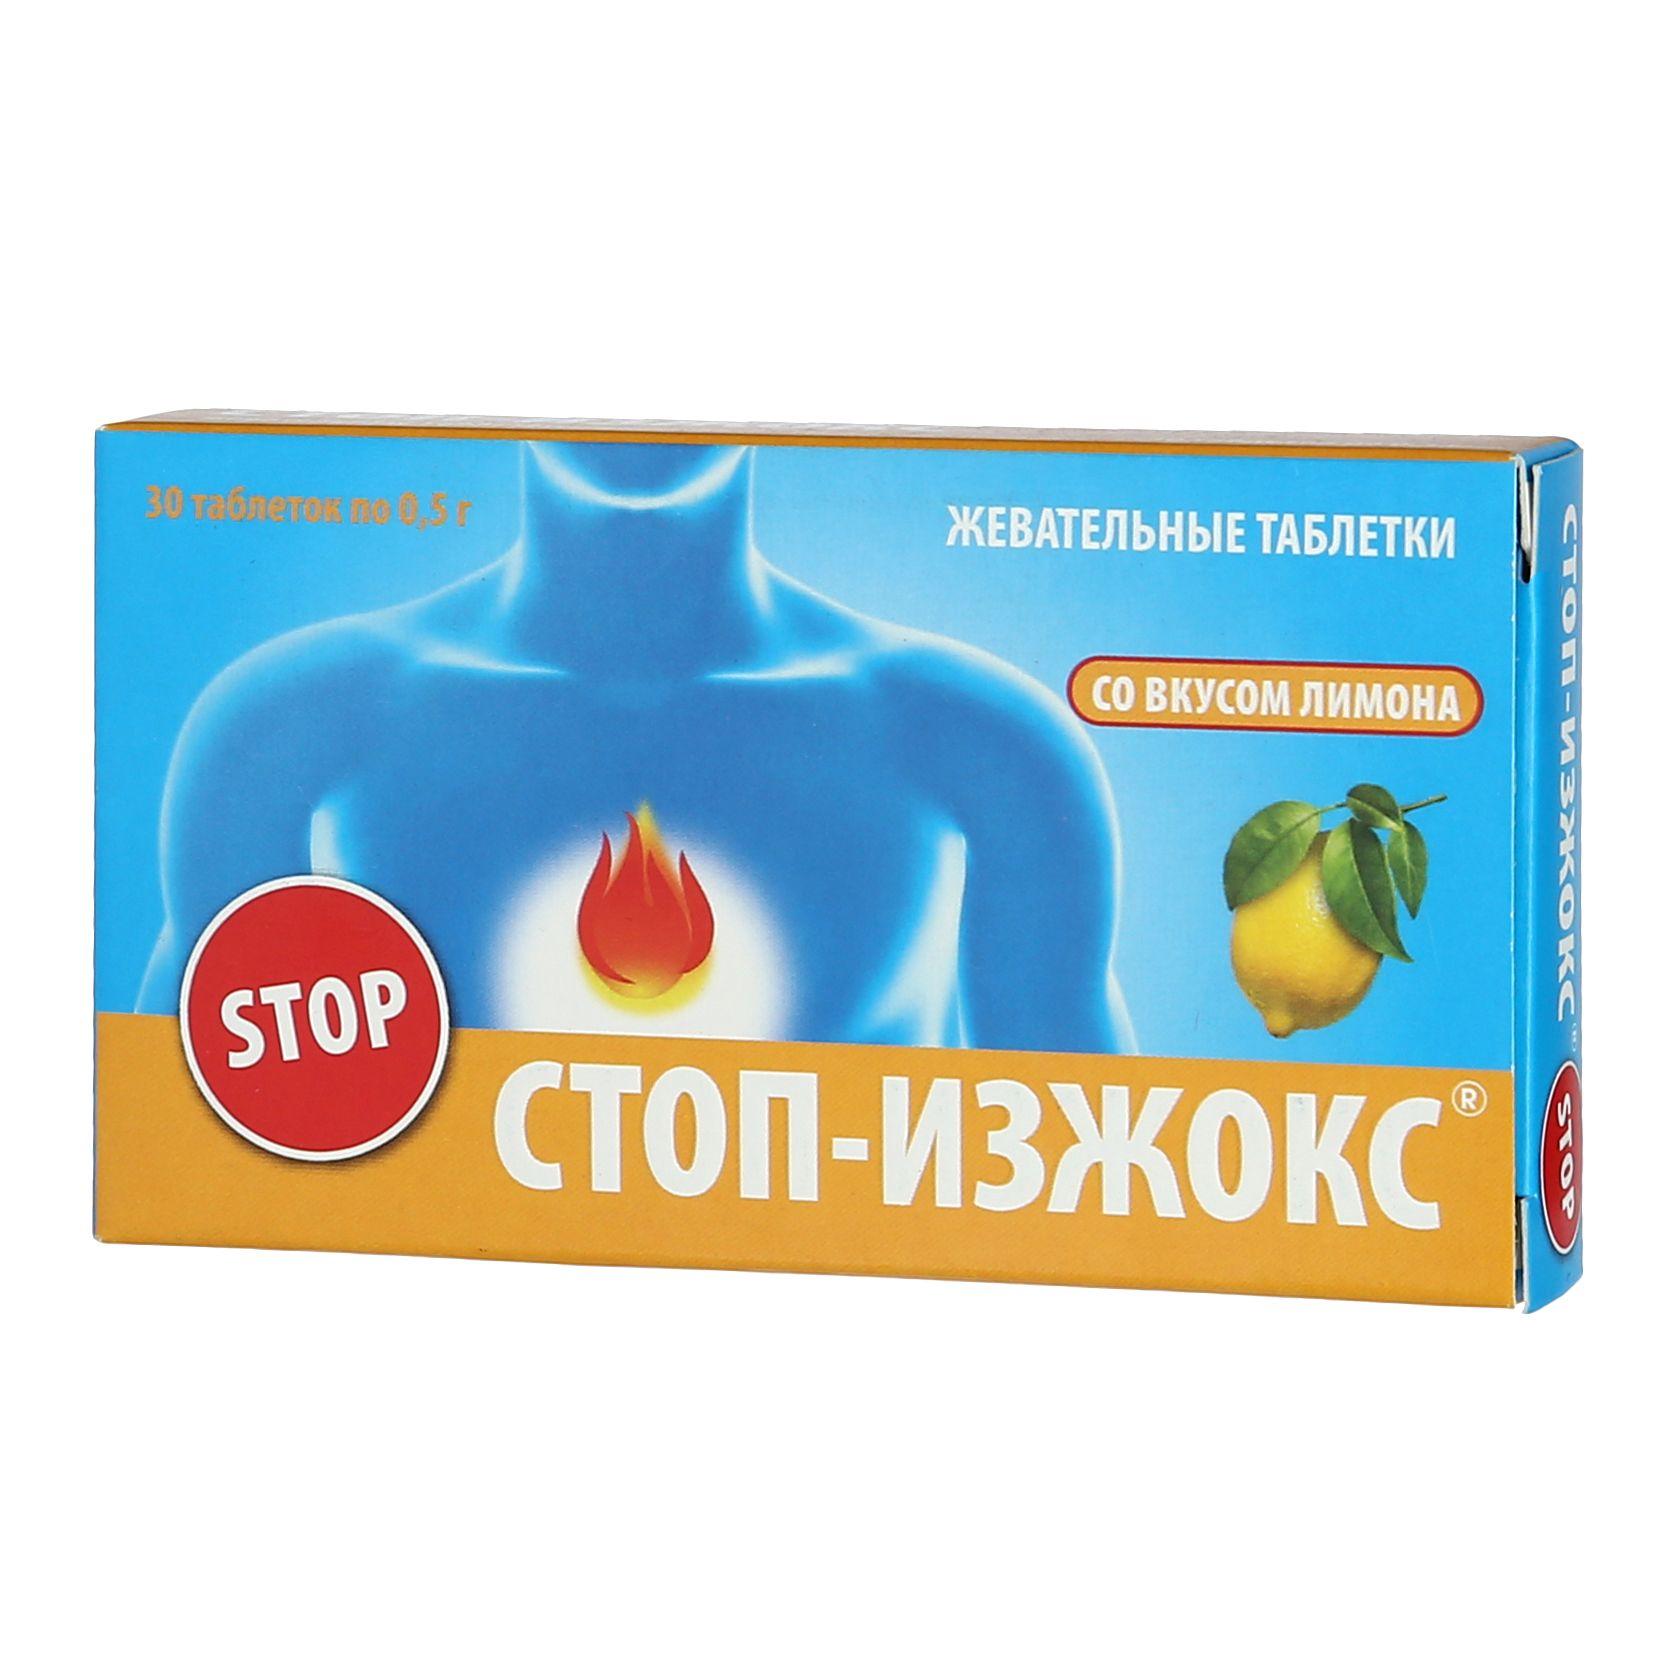 фото упаковки Стоп-изжокс со вкусом лимона